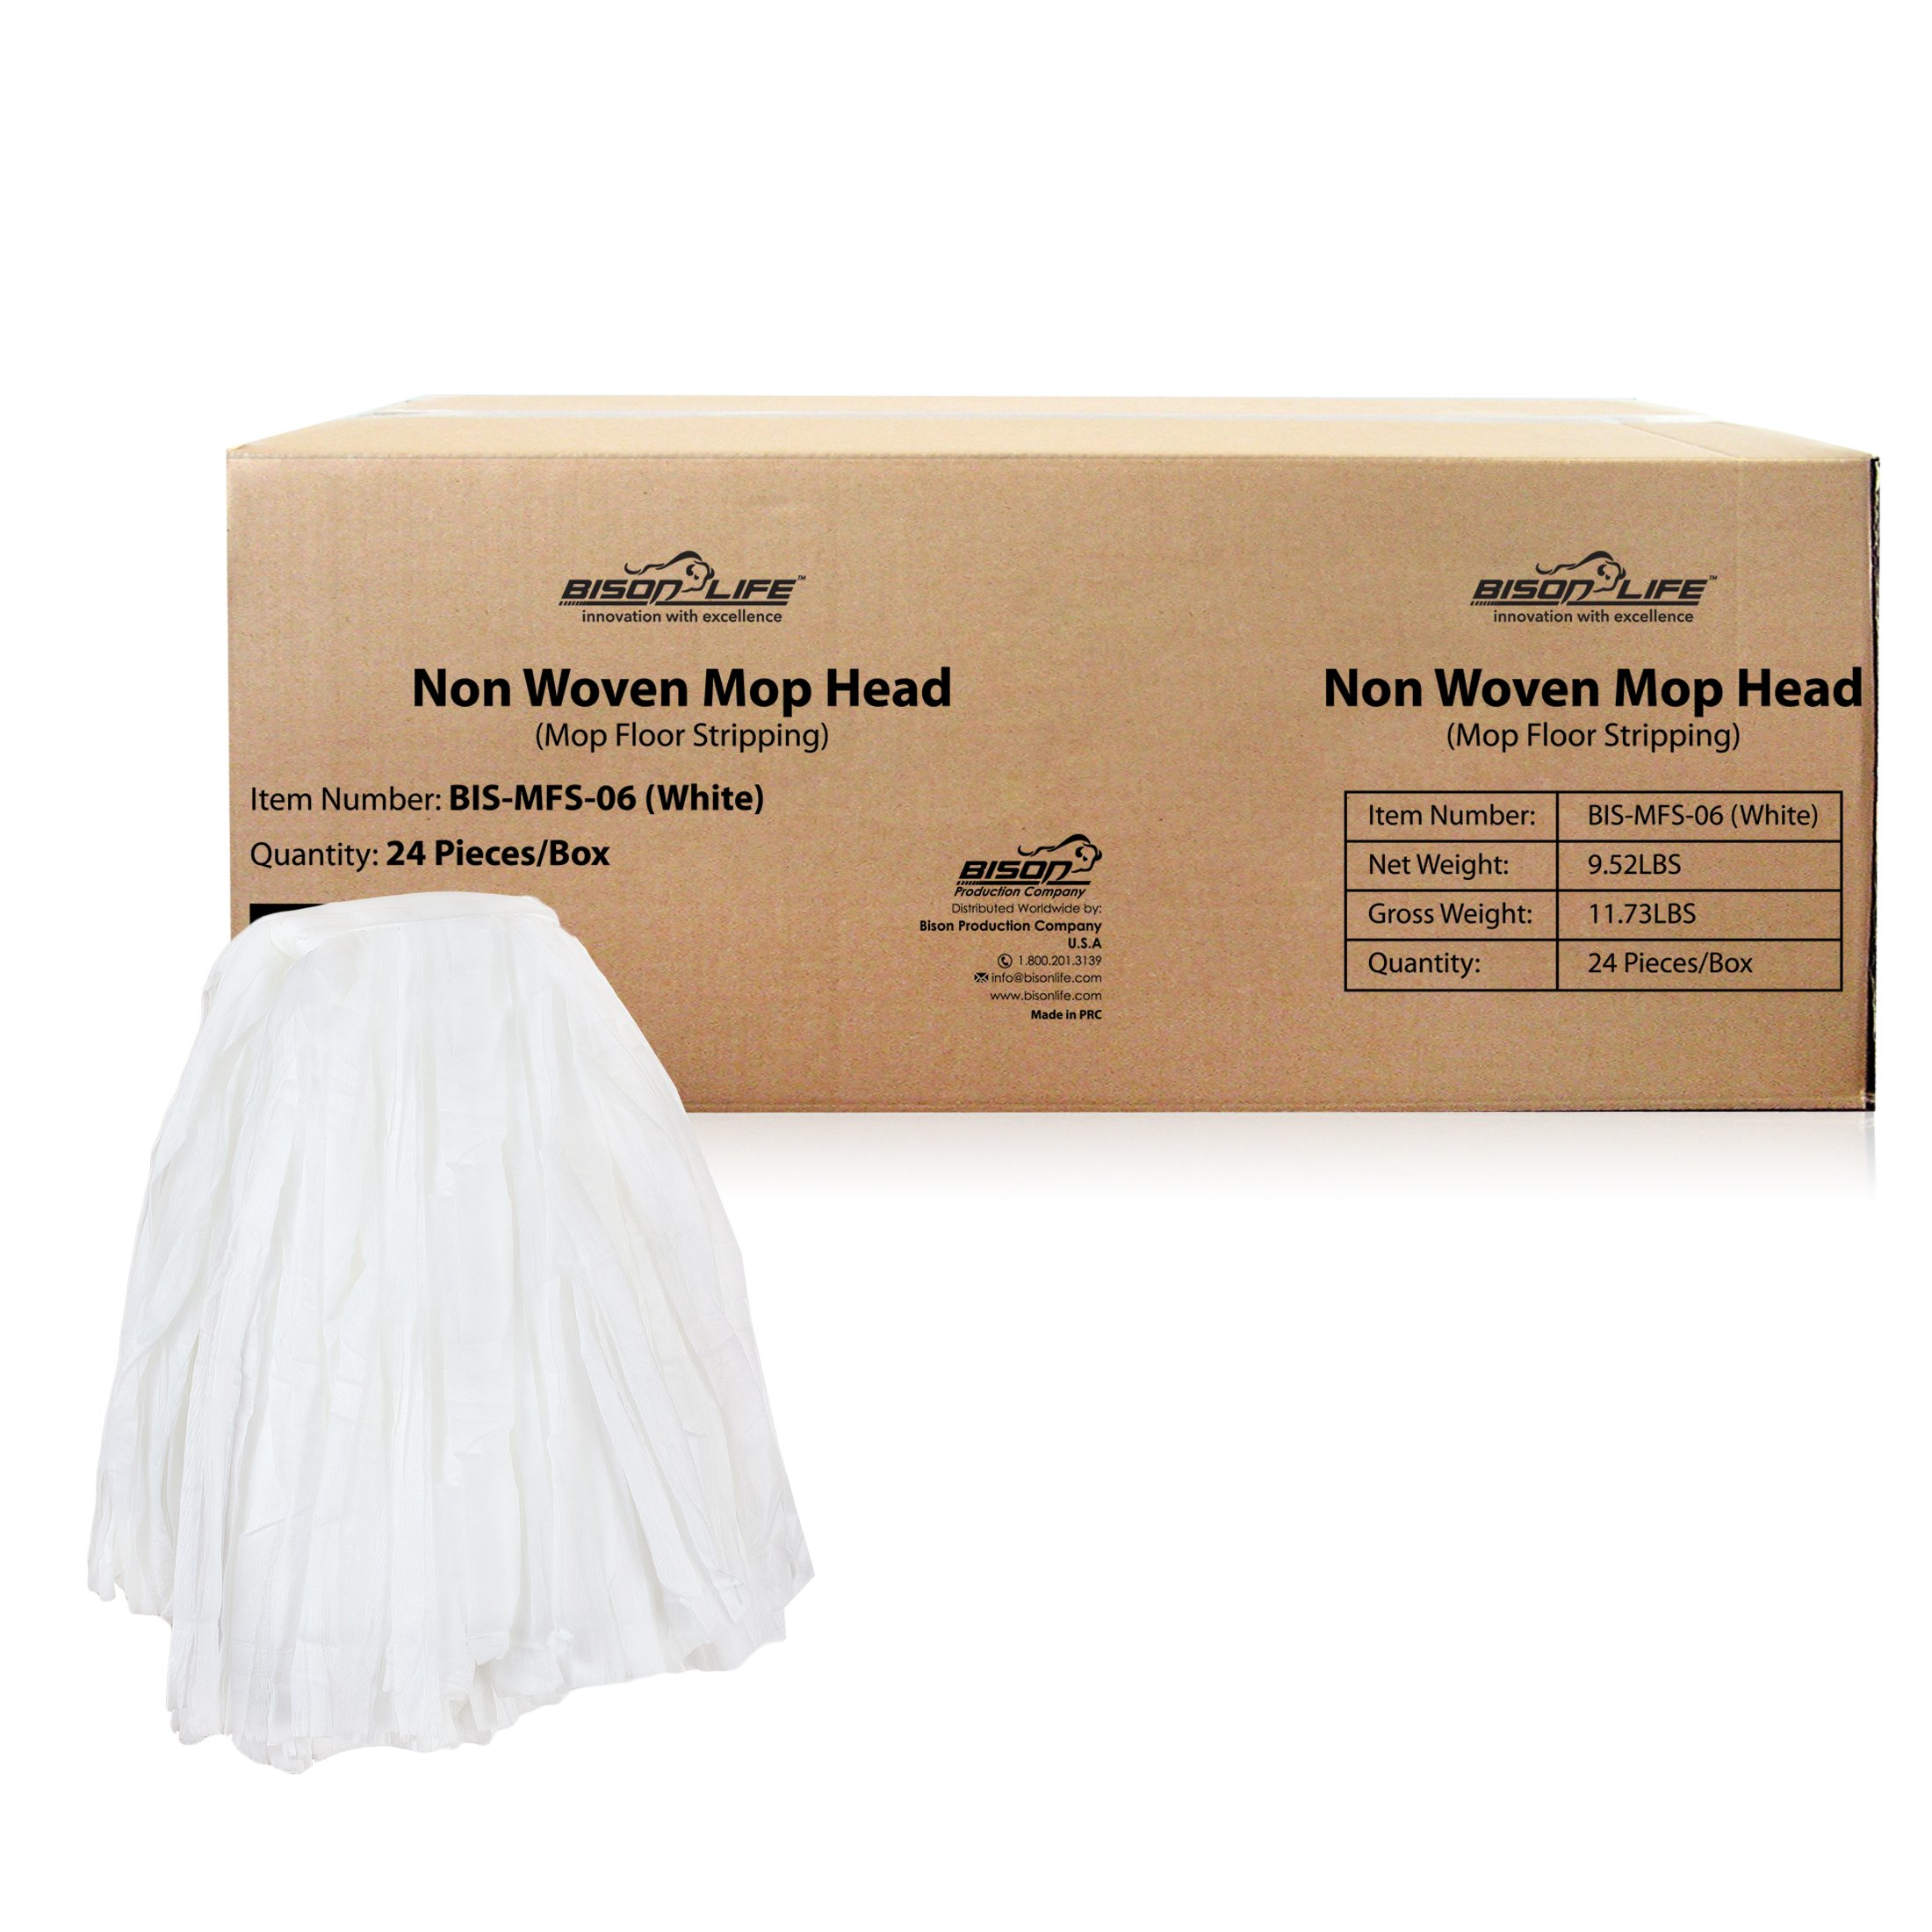 KLEEN HANDLER Disposable Industrial Mop Head Replacement | Non-Woven Cut End Floor Cleaning Wet Mop Head Refill (Case of 24) by KLEEN HANDLER